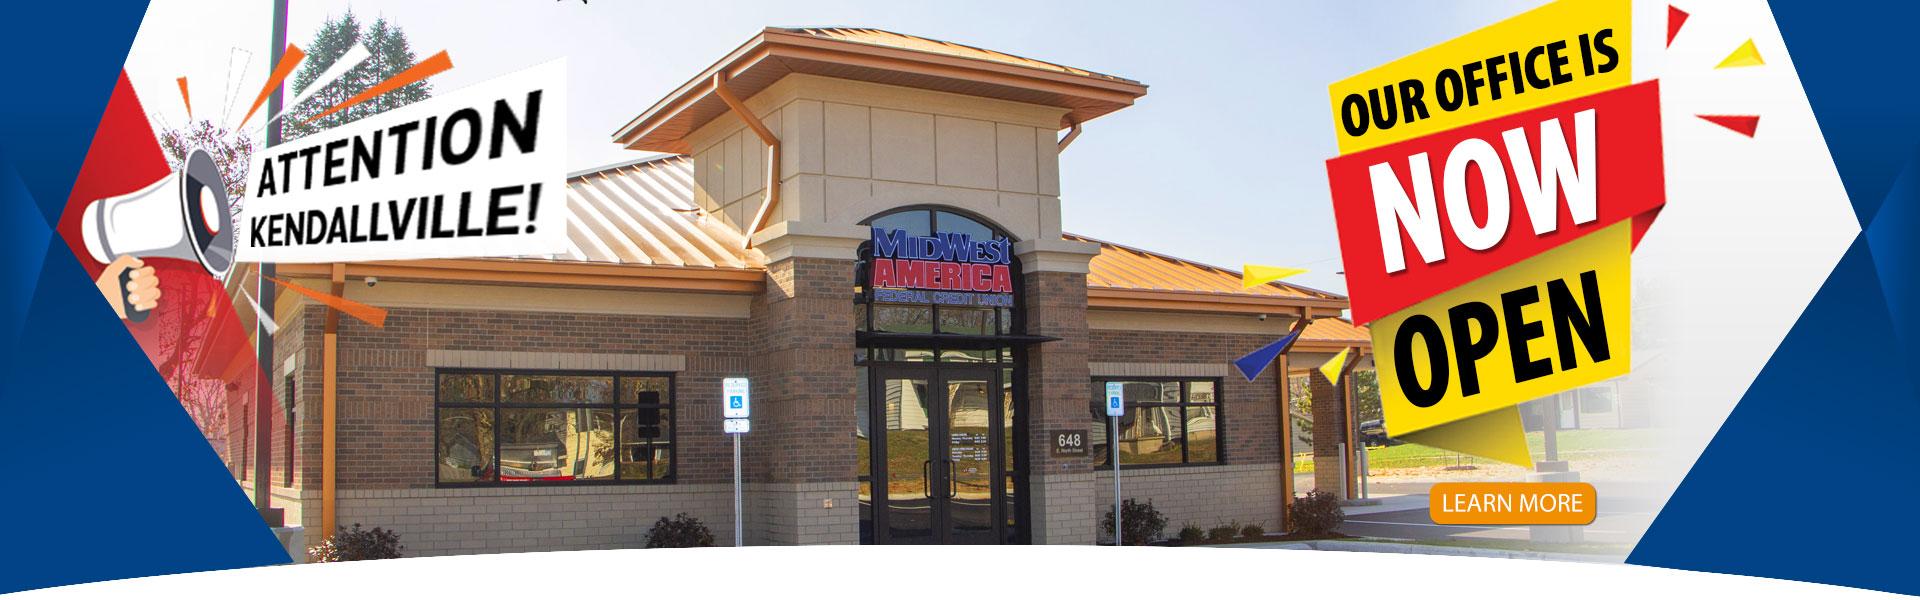 Kendallville Branch Now Open